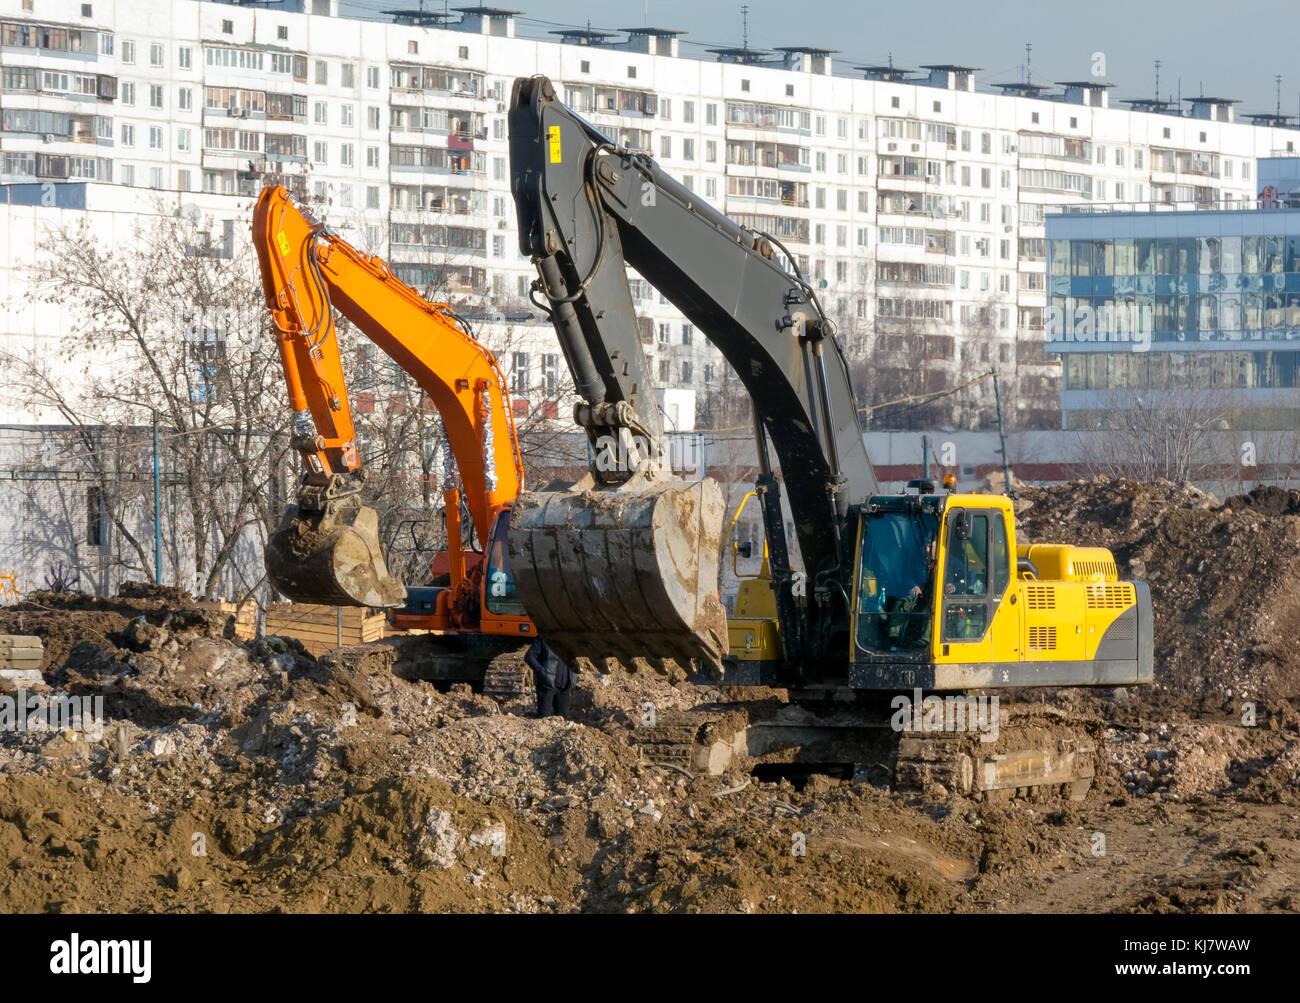 Excavators working - Stock Image